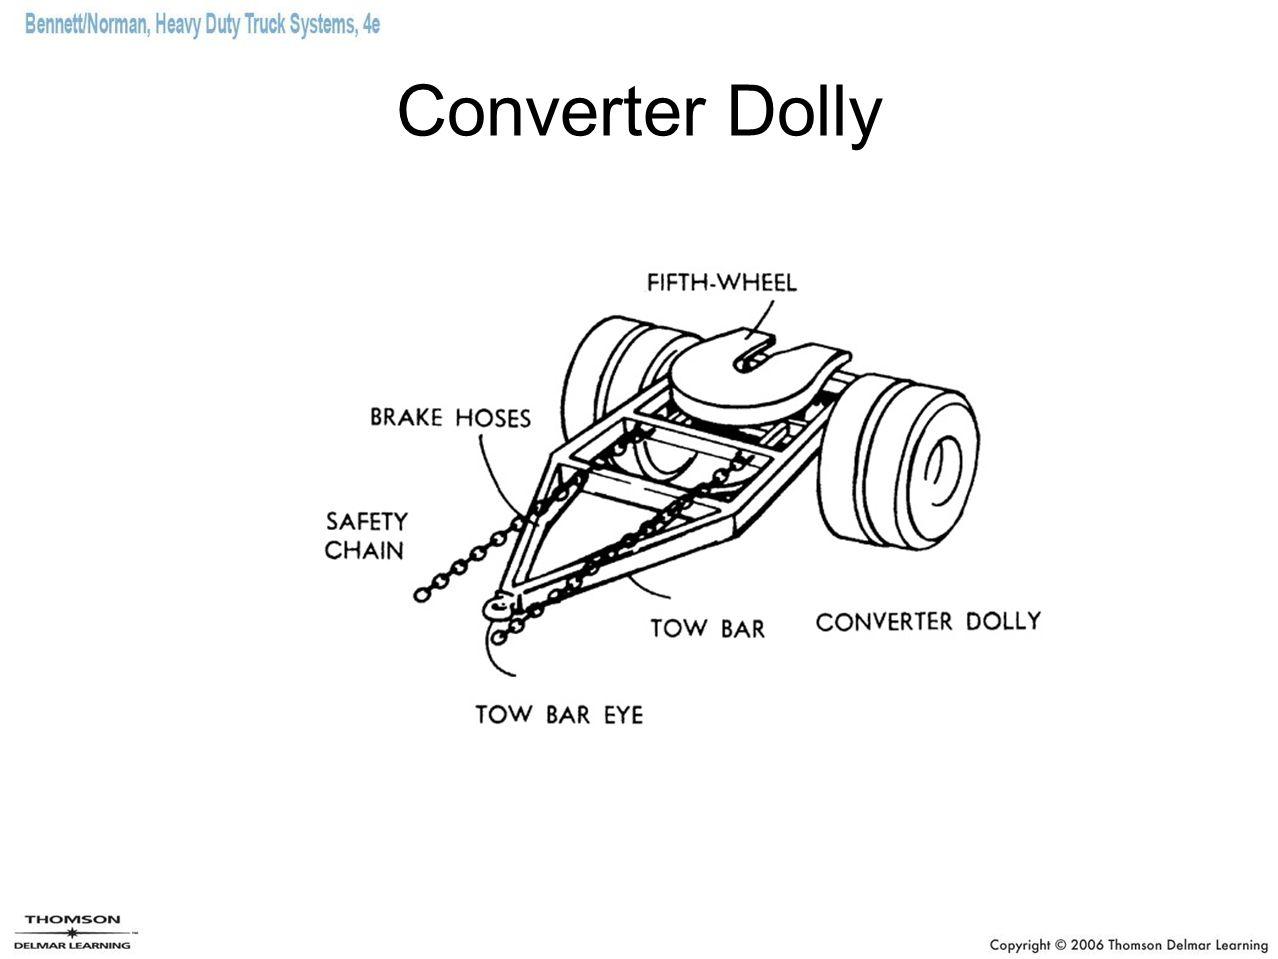 Converter Dolly